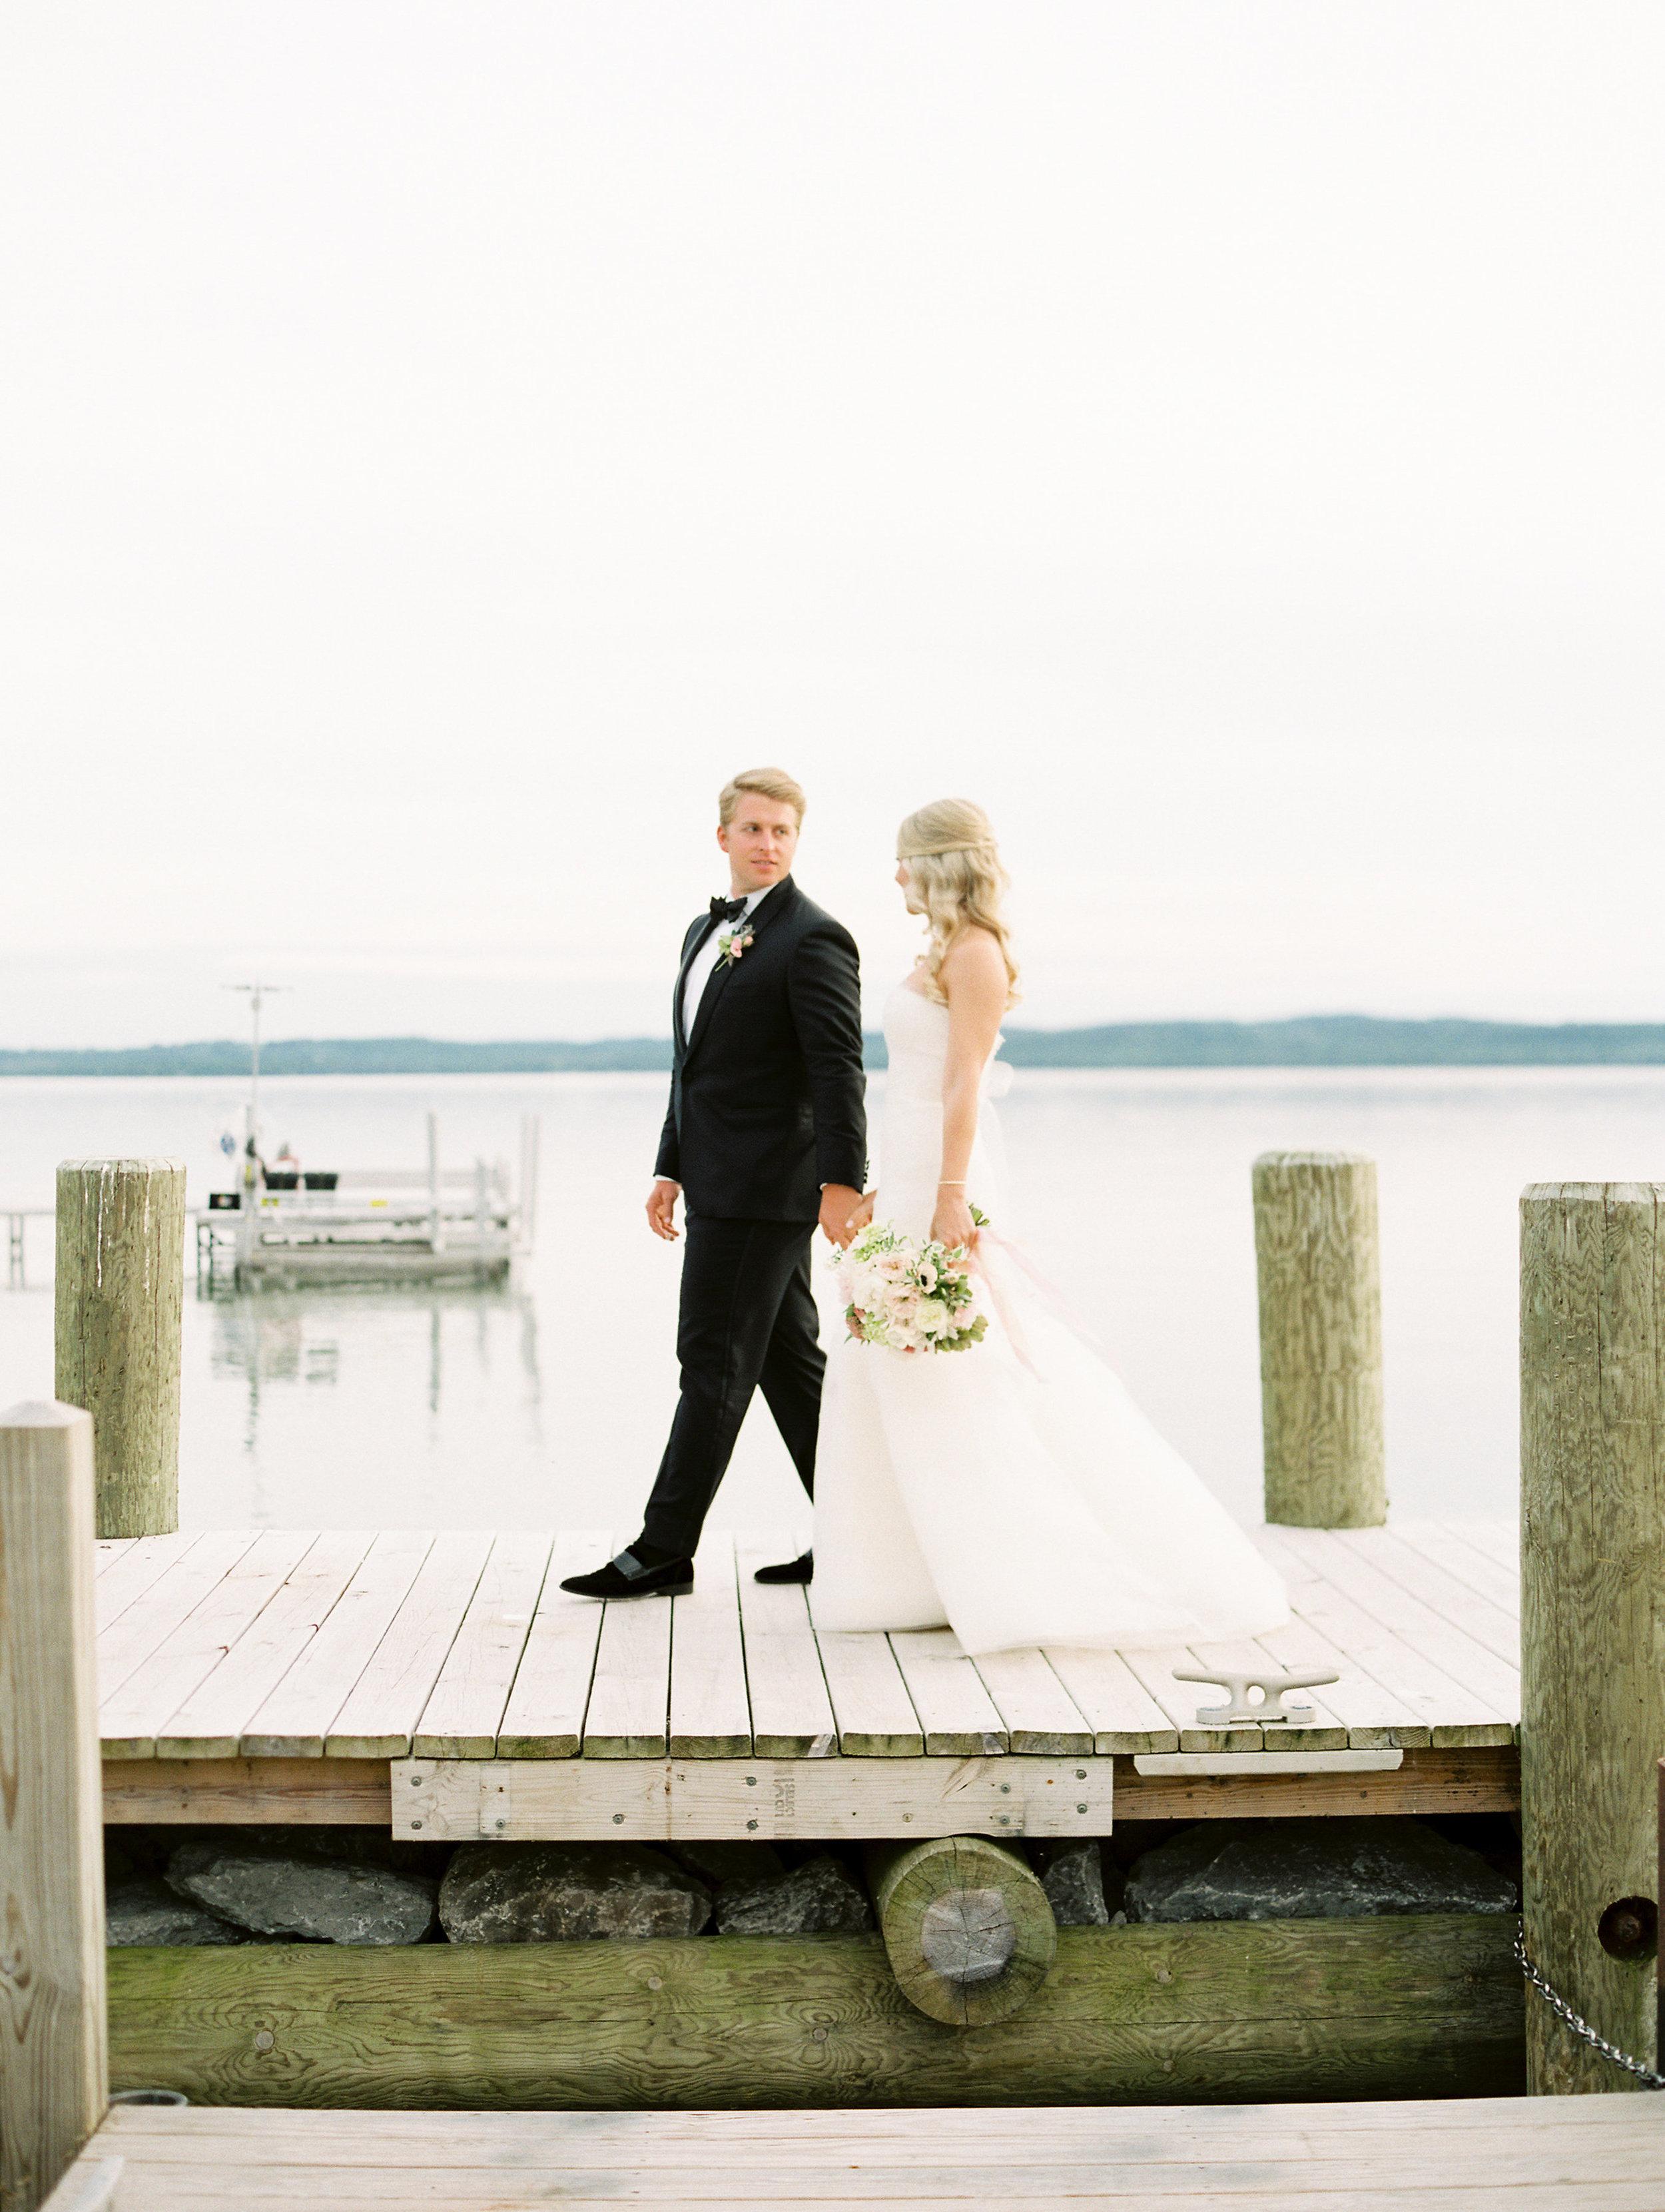 Coffman+Wedding+Bride+Groom+Sunset-81.jpg